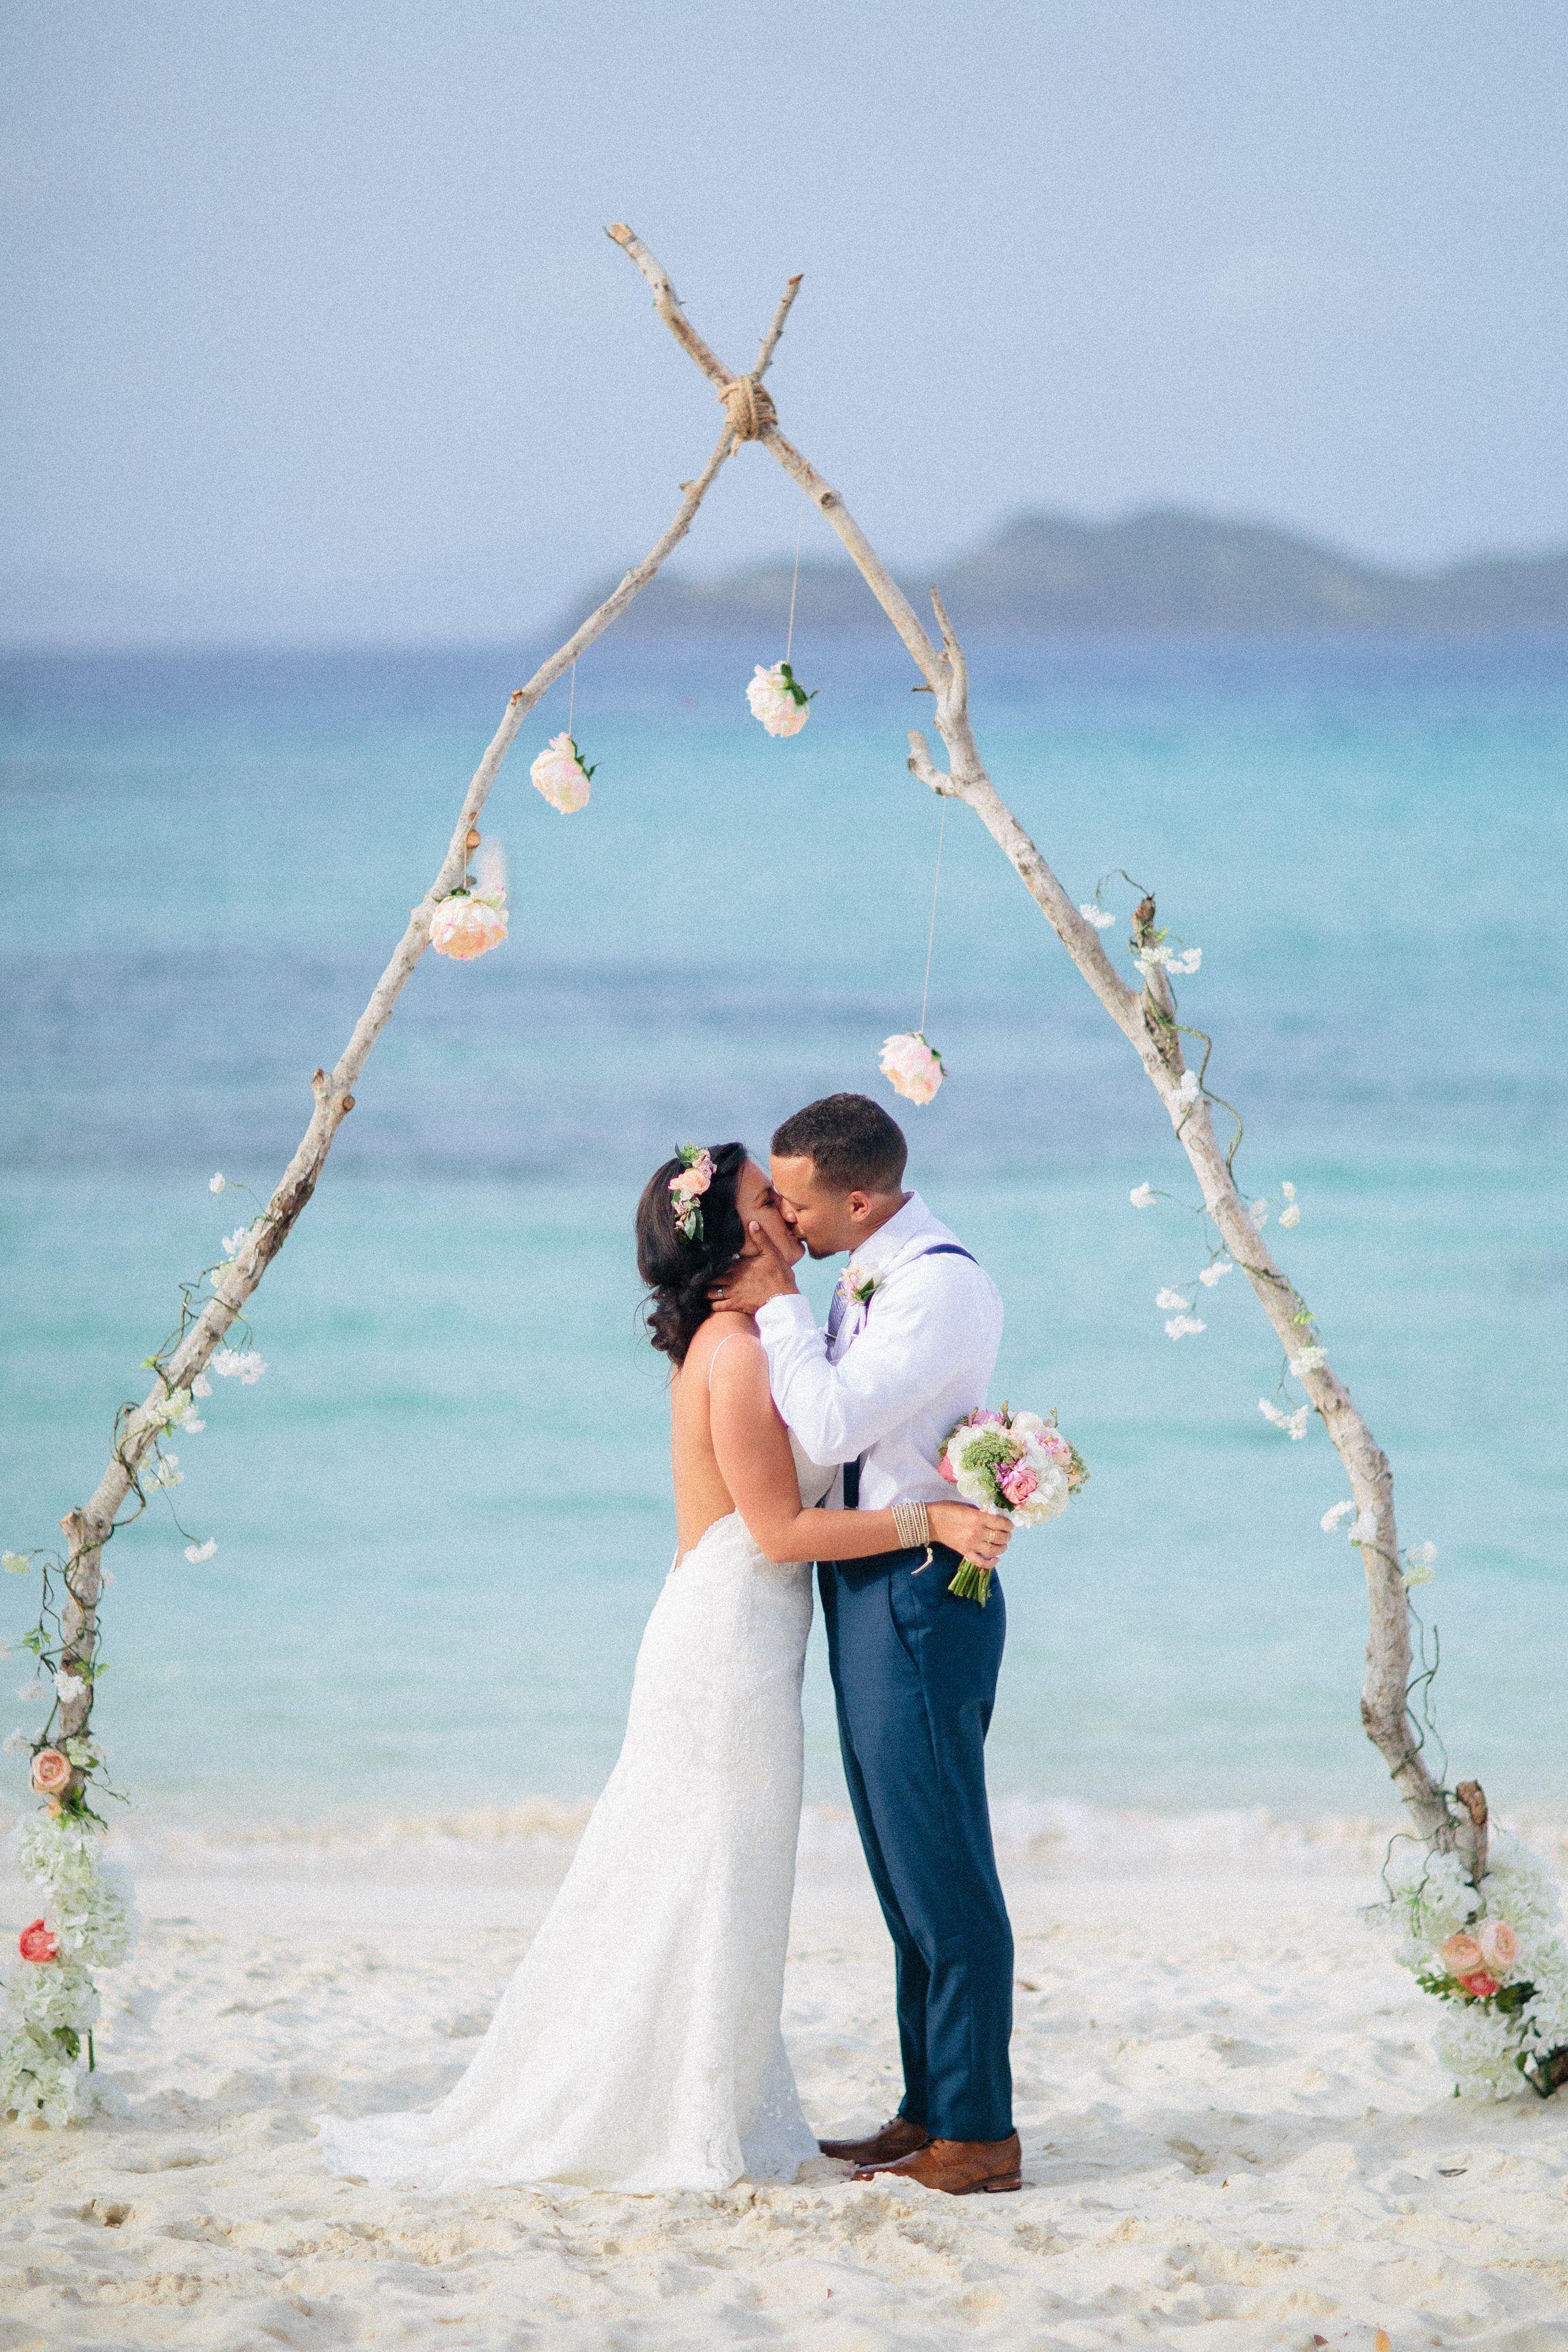 Virgin Islands Destination Wedding Linquist Beach St Thomas Photography Maiko Media Island Destinations Wedding Photo